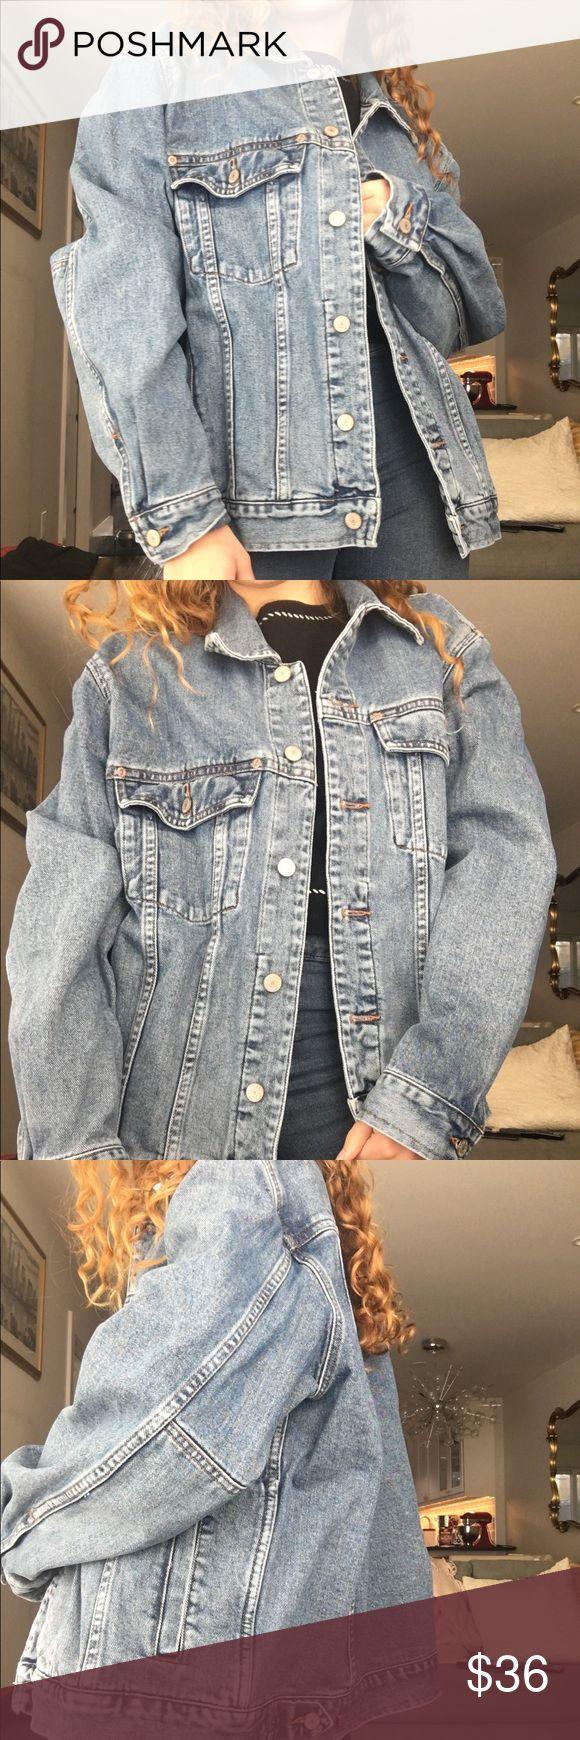 Oversized Denim Jacket Worn in oversized Eddie Bauer denim jacket. Men's Medium but fits a sized small perfectly oversized Brandy Melville Jackets & Coats Jean Jackets